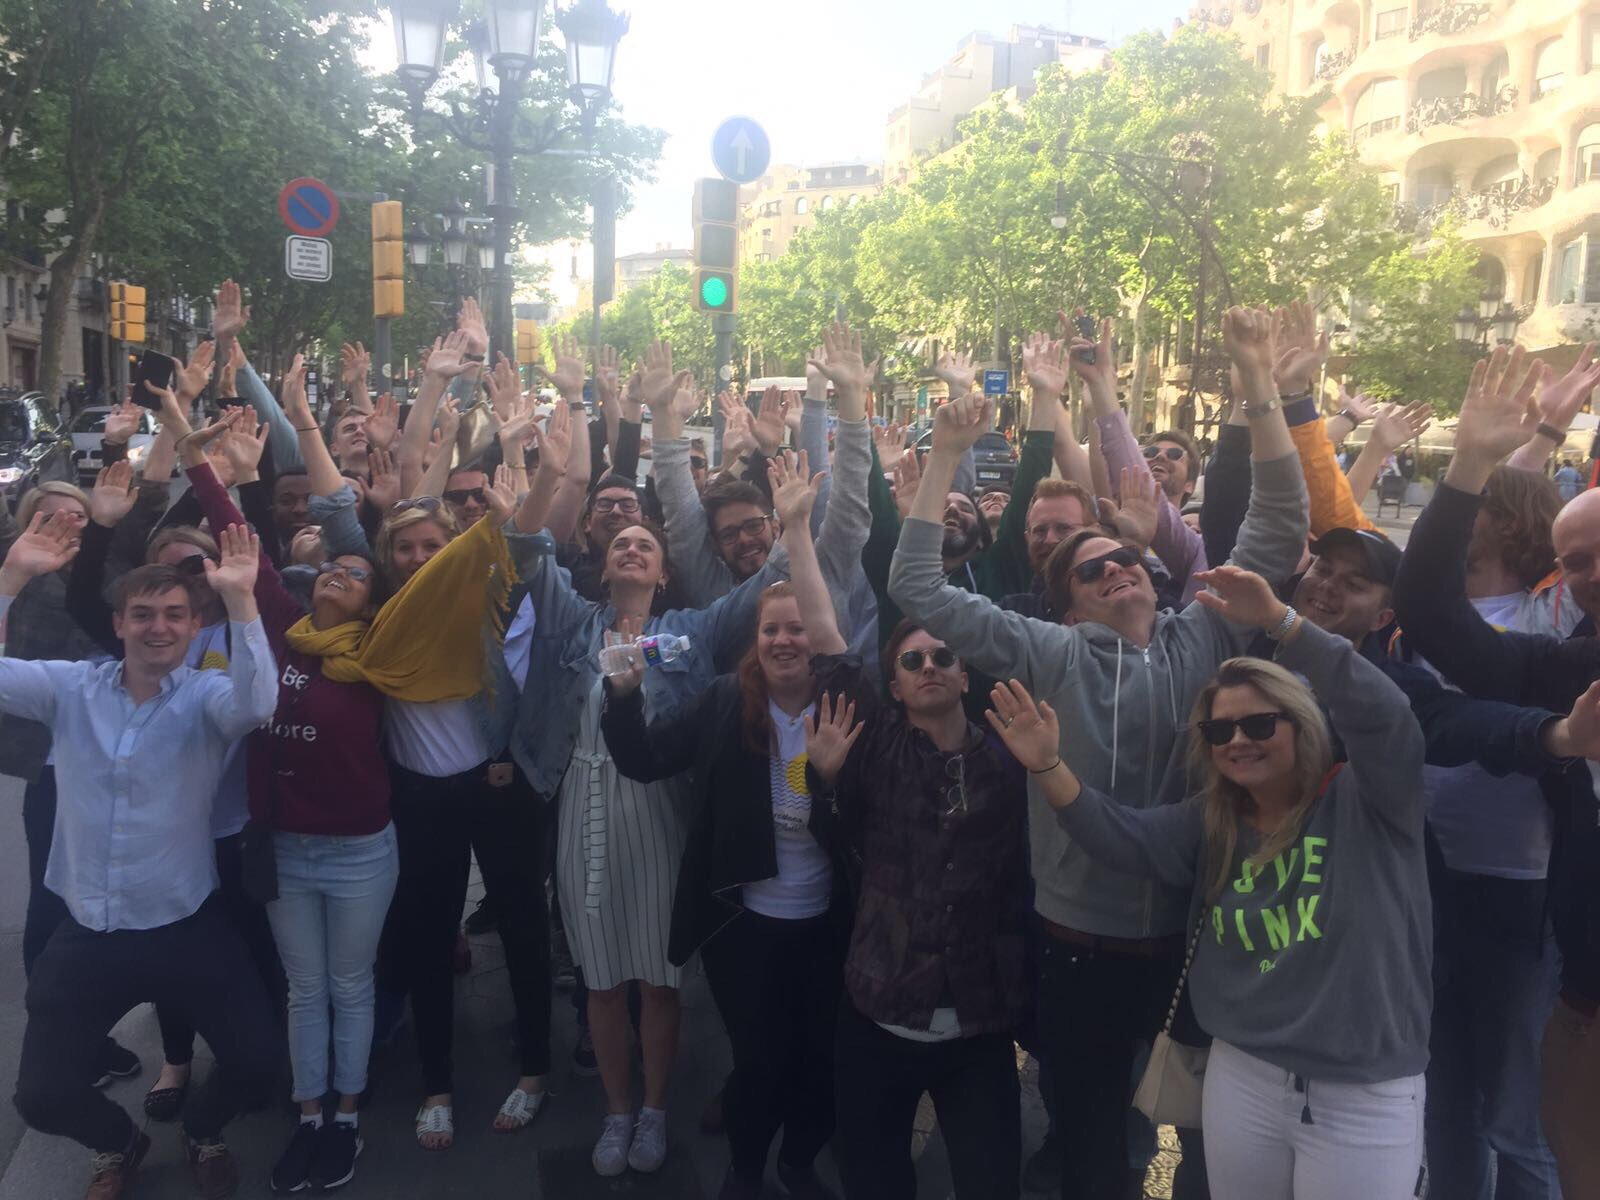 Peakon startup retreat with team-building activities in Barcelona in May